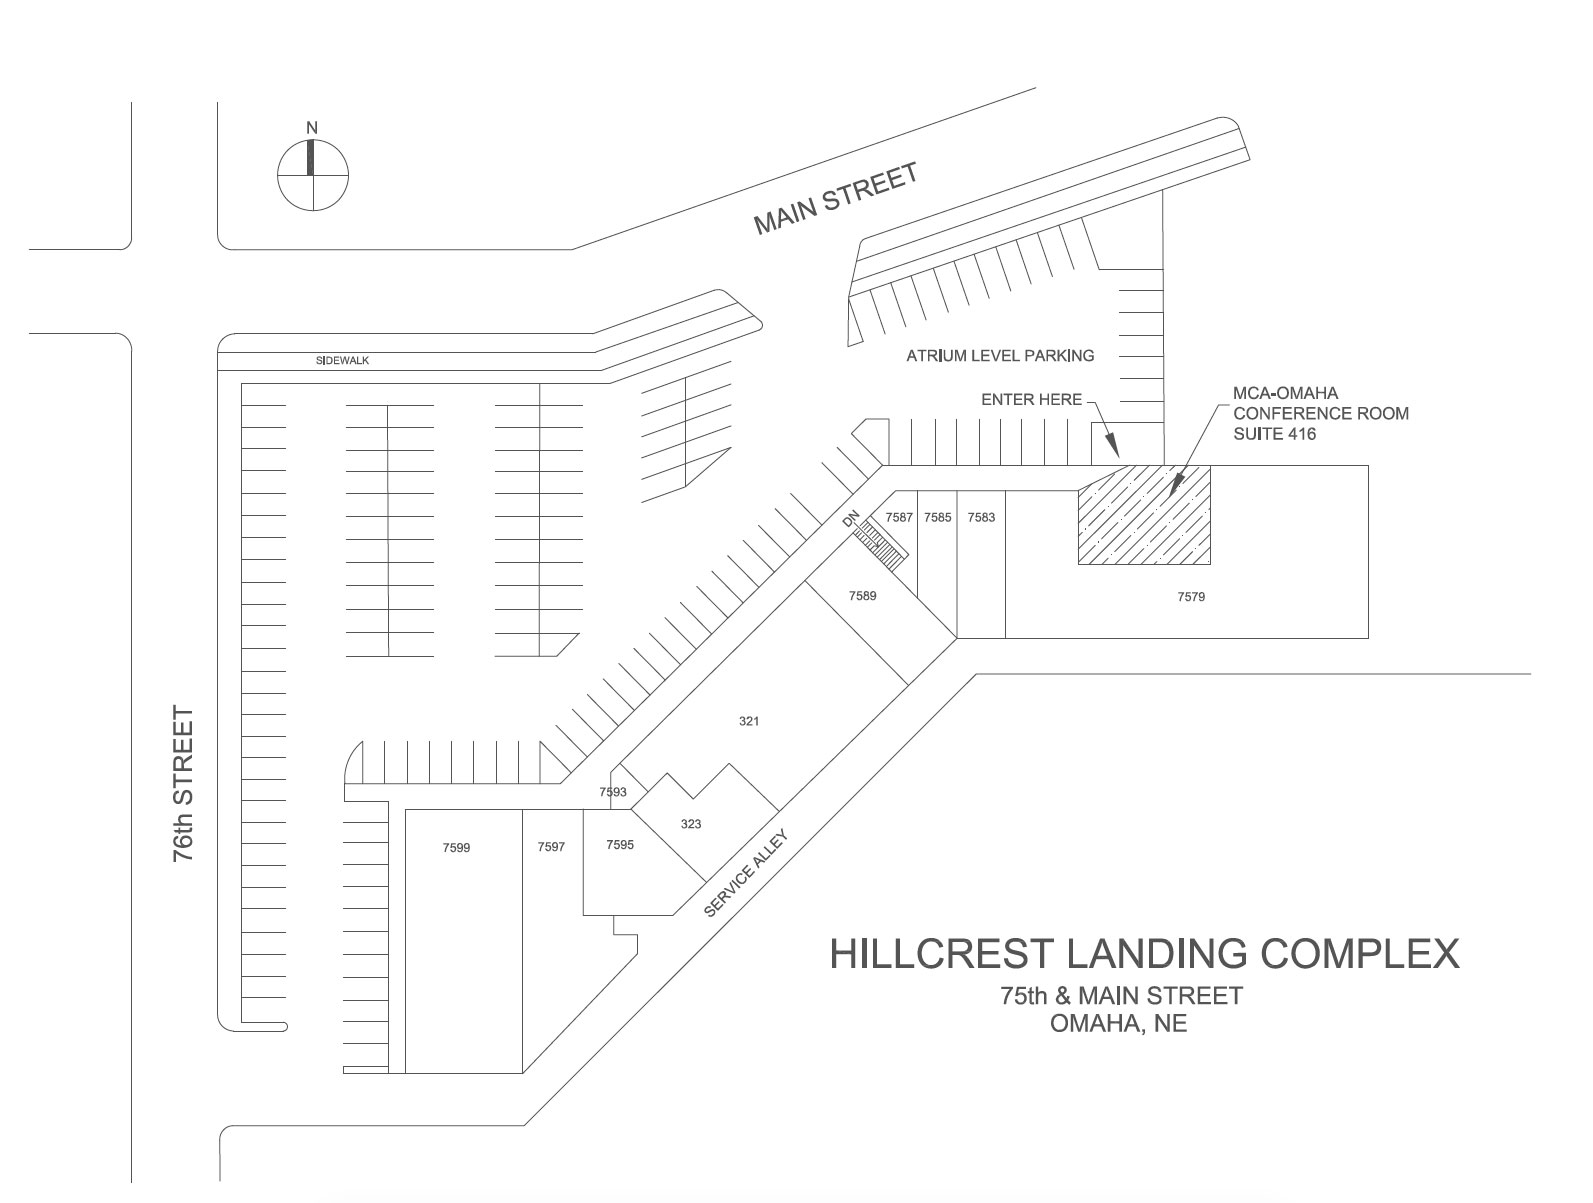 MCA Parking Map